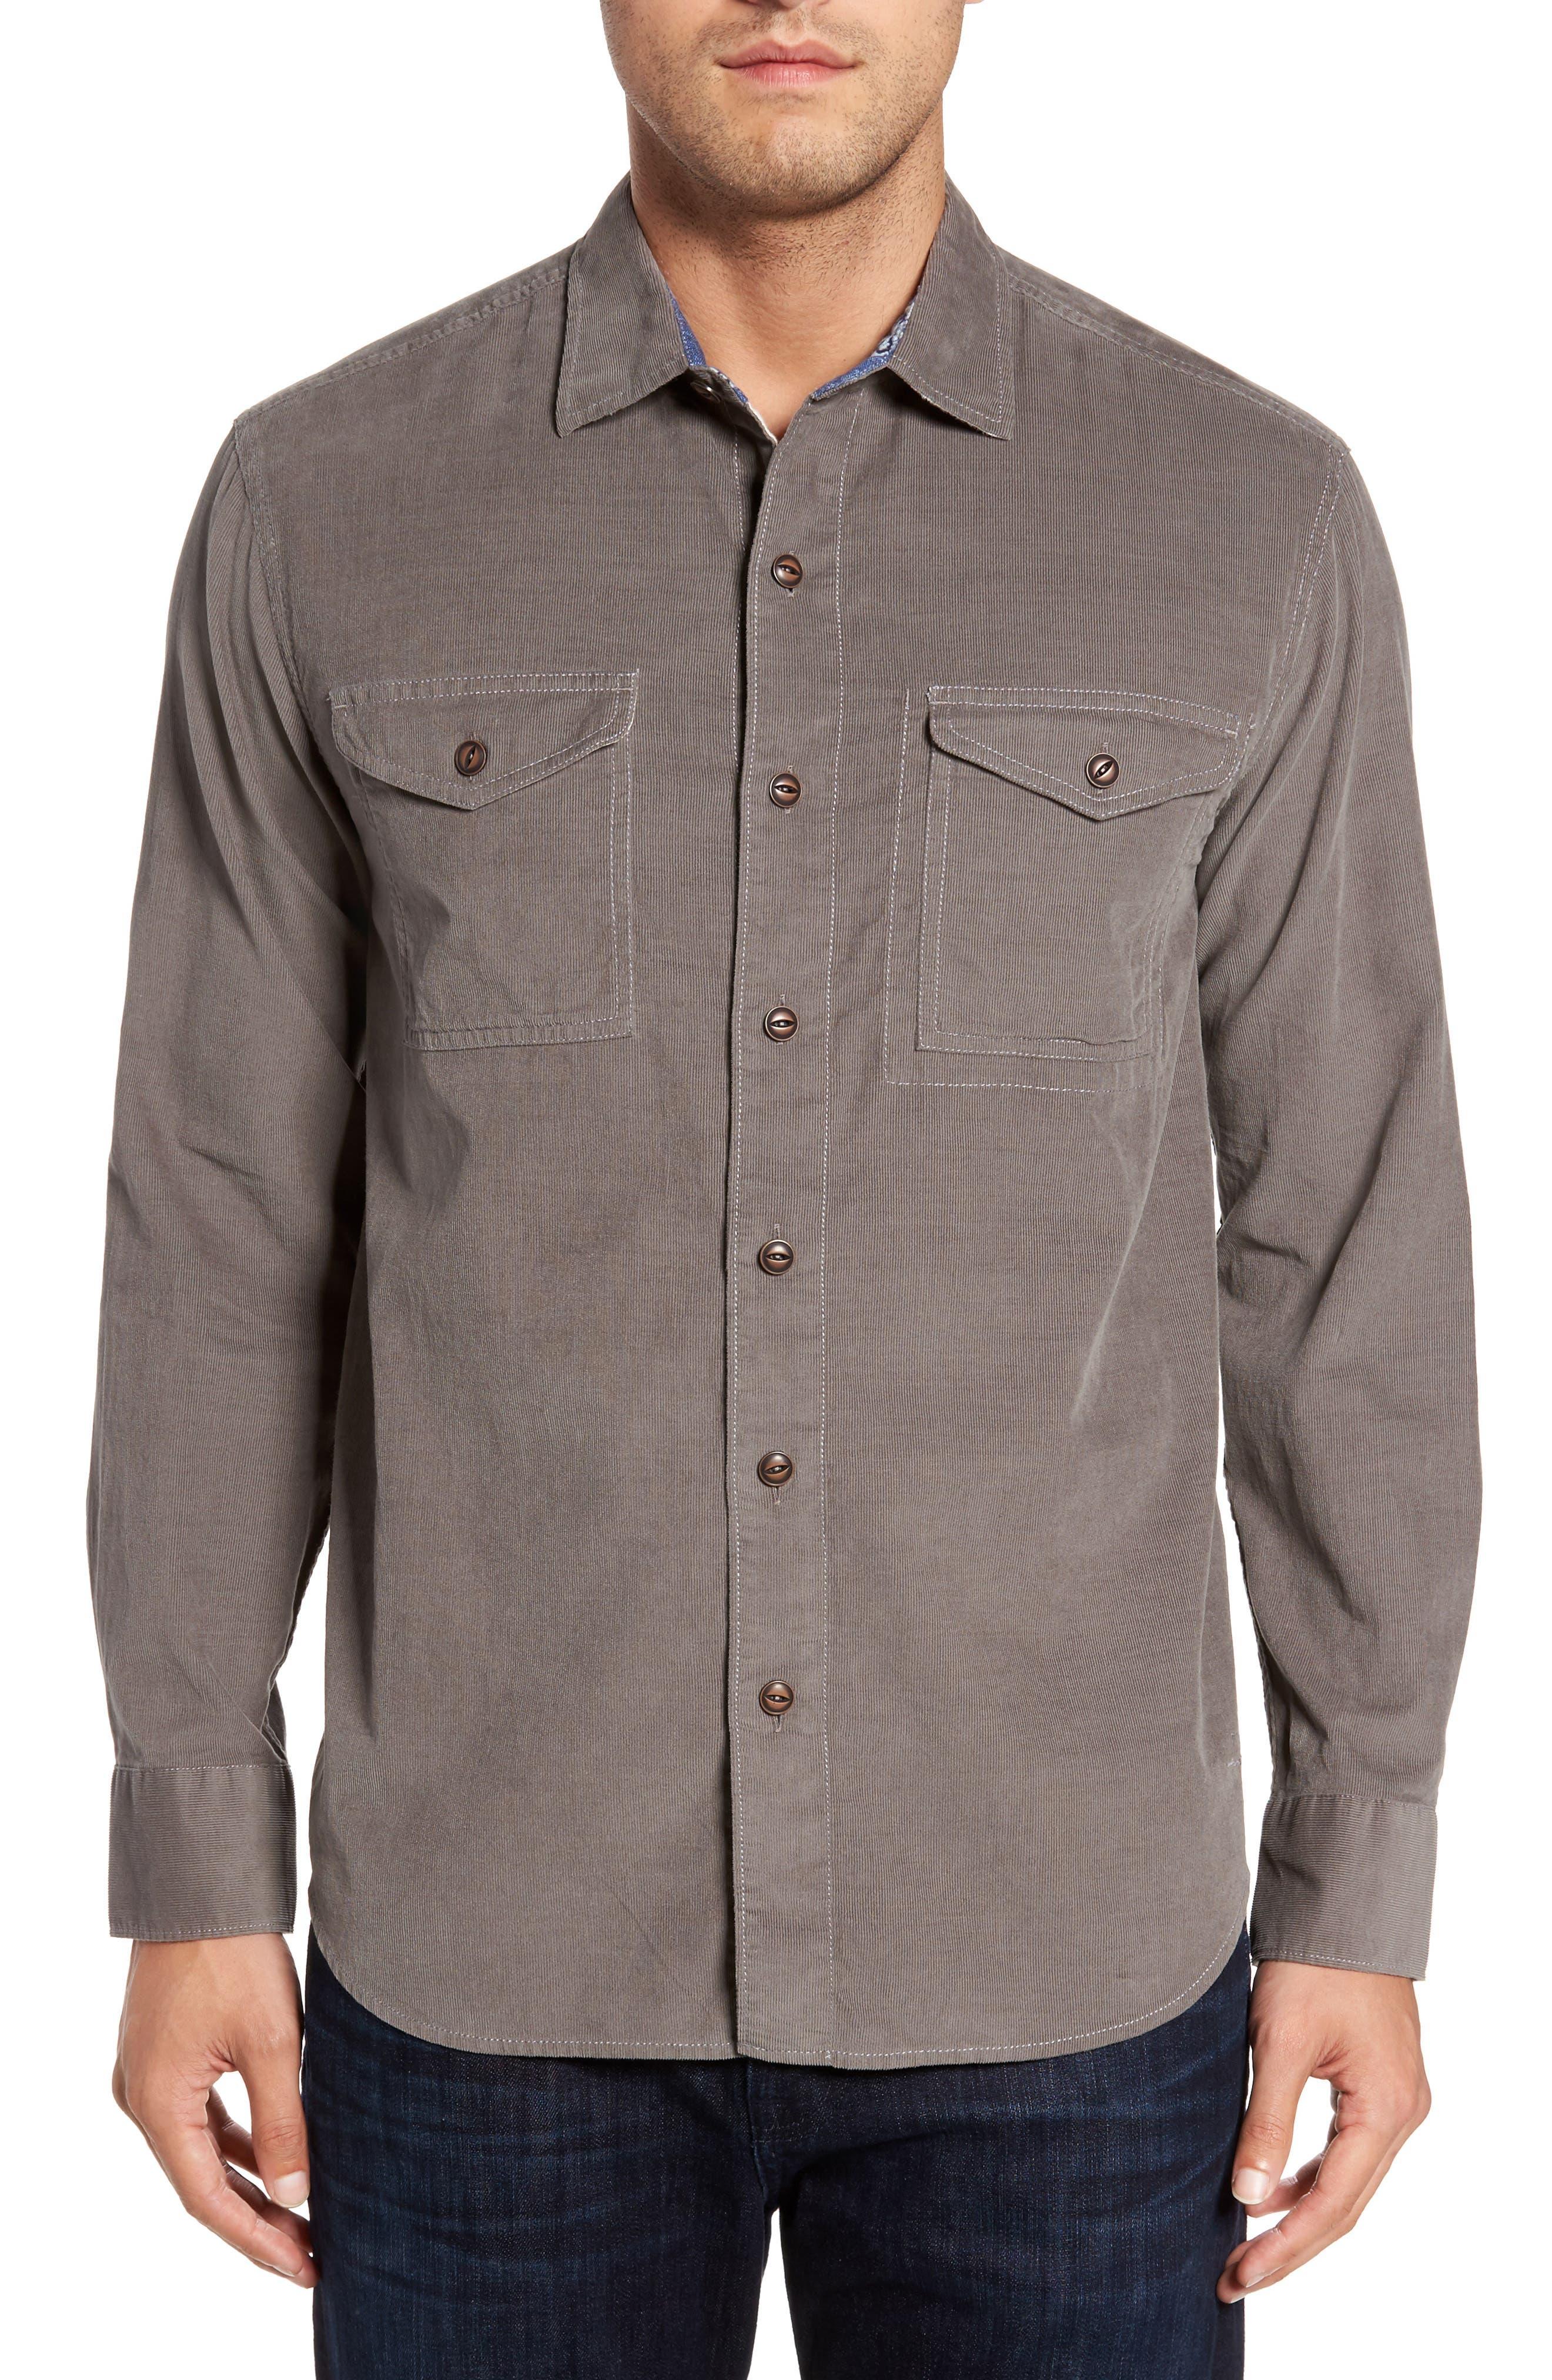 Harrison Cord Standard Fit Shirt,                             Main thumbnail 1, color,                             Pebble Grey